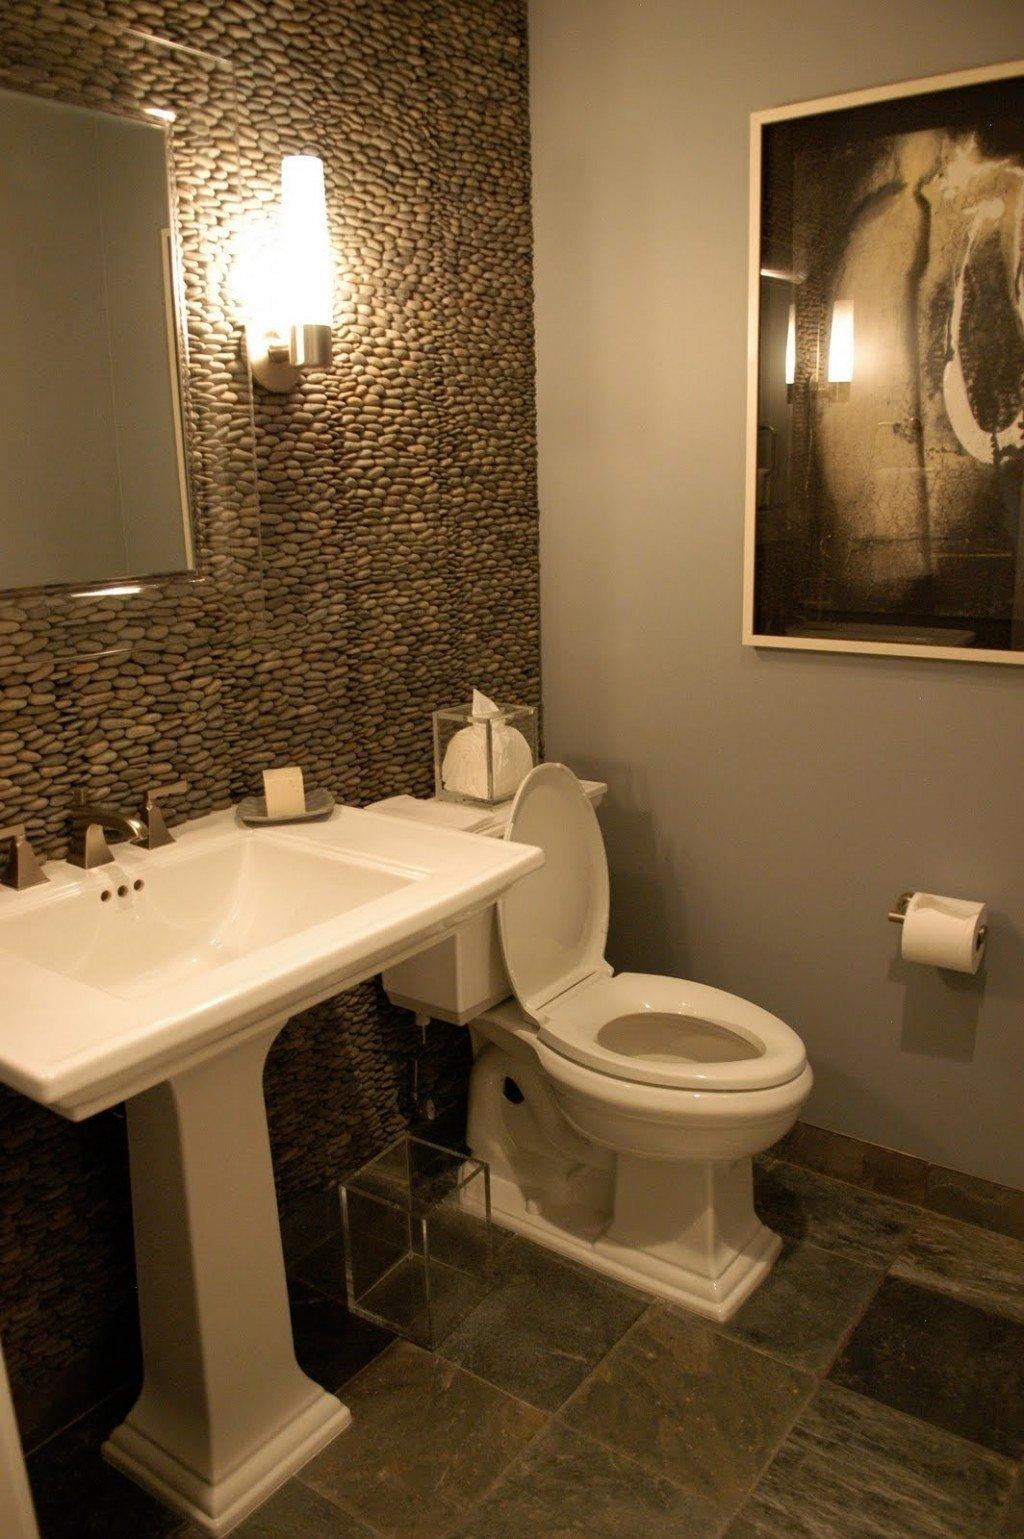 10 Ideal Small Powder Room Decorating Ideas powder room decorating ideas home decor furniture 2020